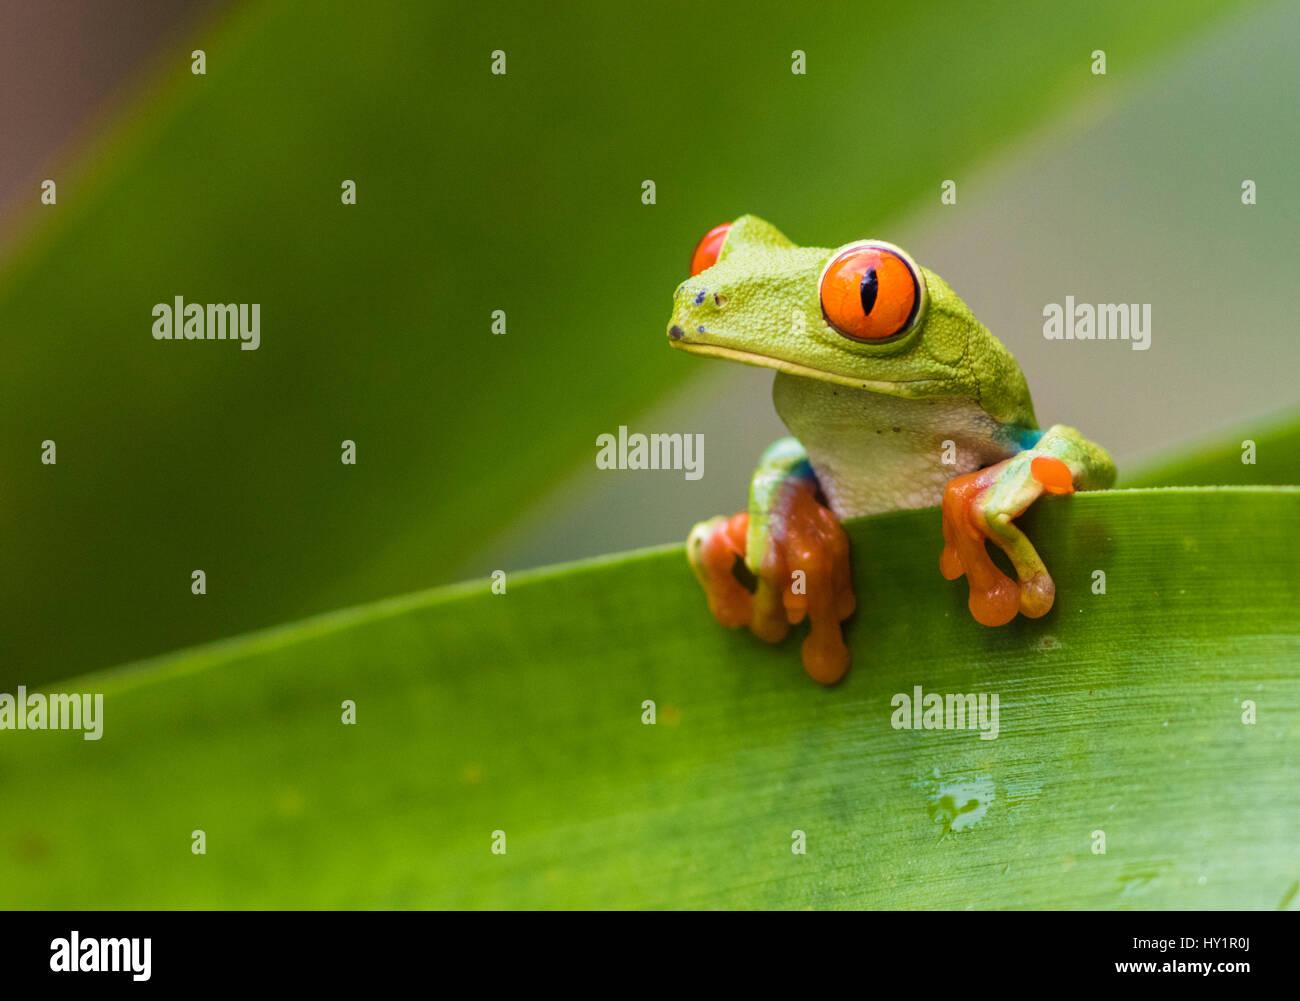 Red-eyed tree frog, Agalychnis callidryas, climbing on a leaf, looking to the side, Laguna del Lagarto, Boca Tapada, San Carlos, Costa Rica Stock Photo